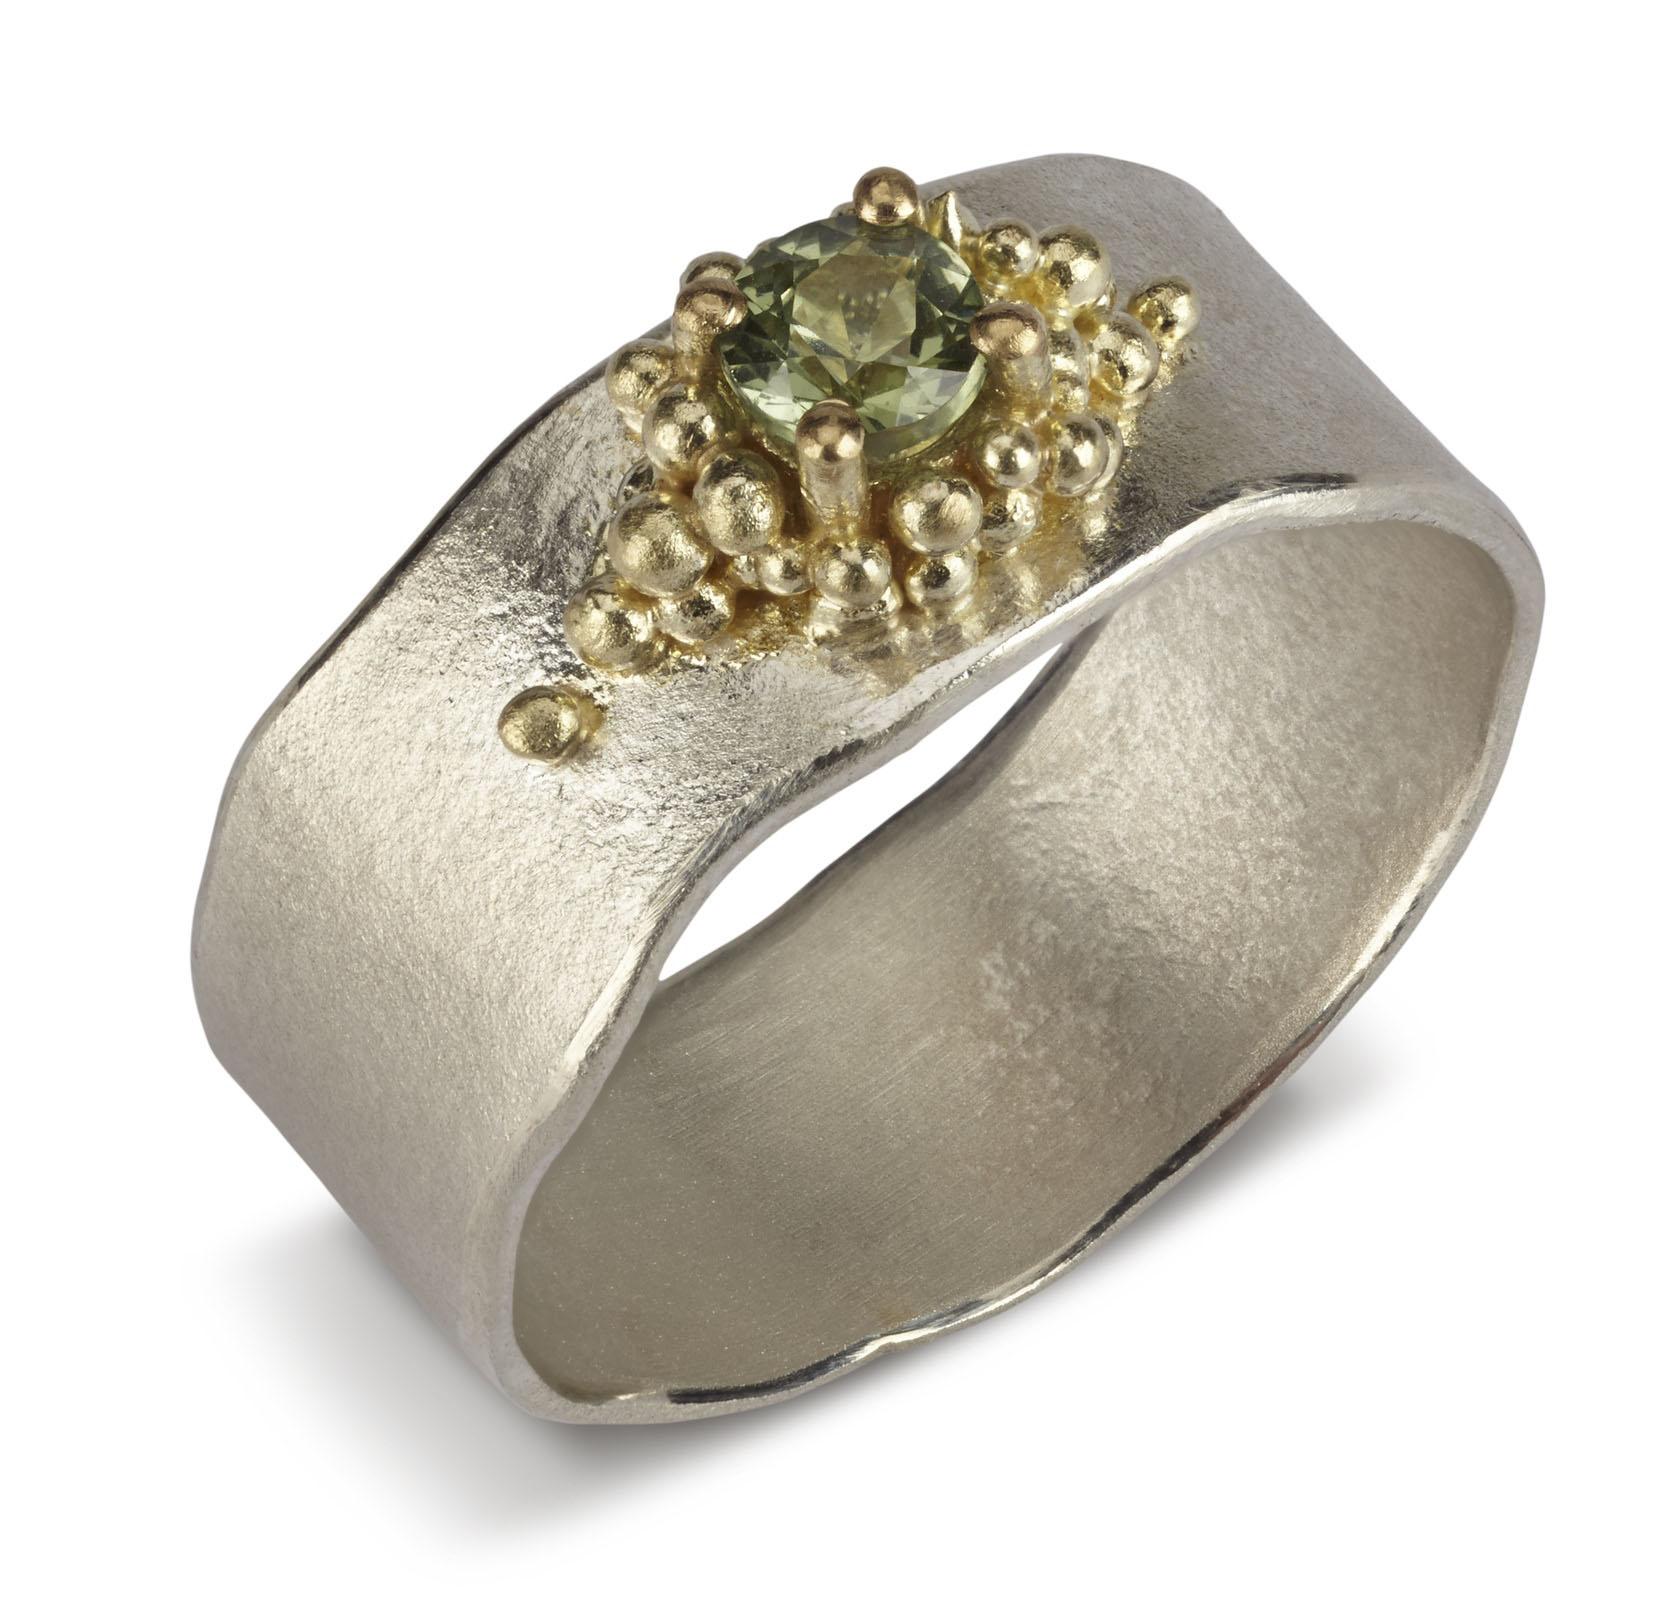 Modern Jewelry Design Ideas: Sapphire Granulated Ring